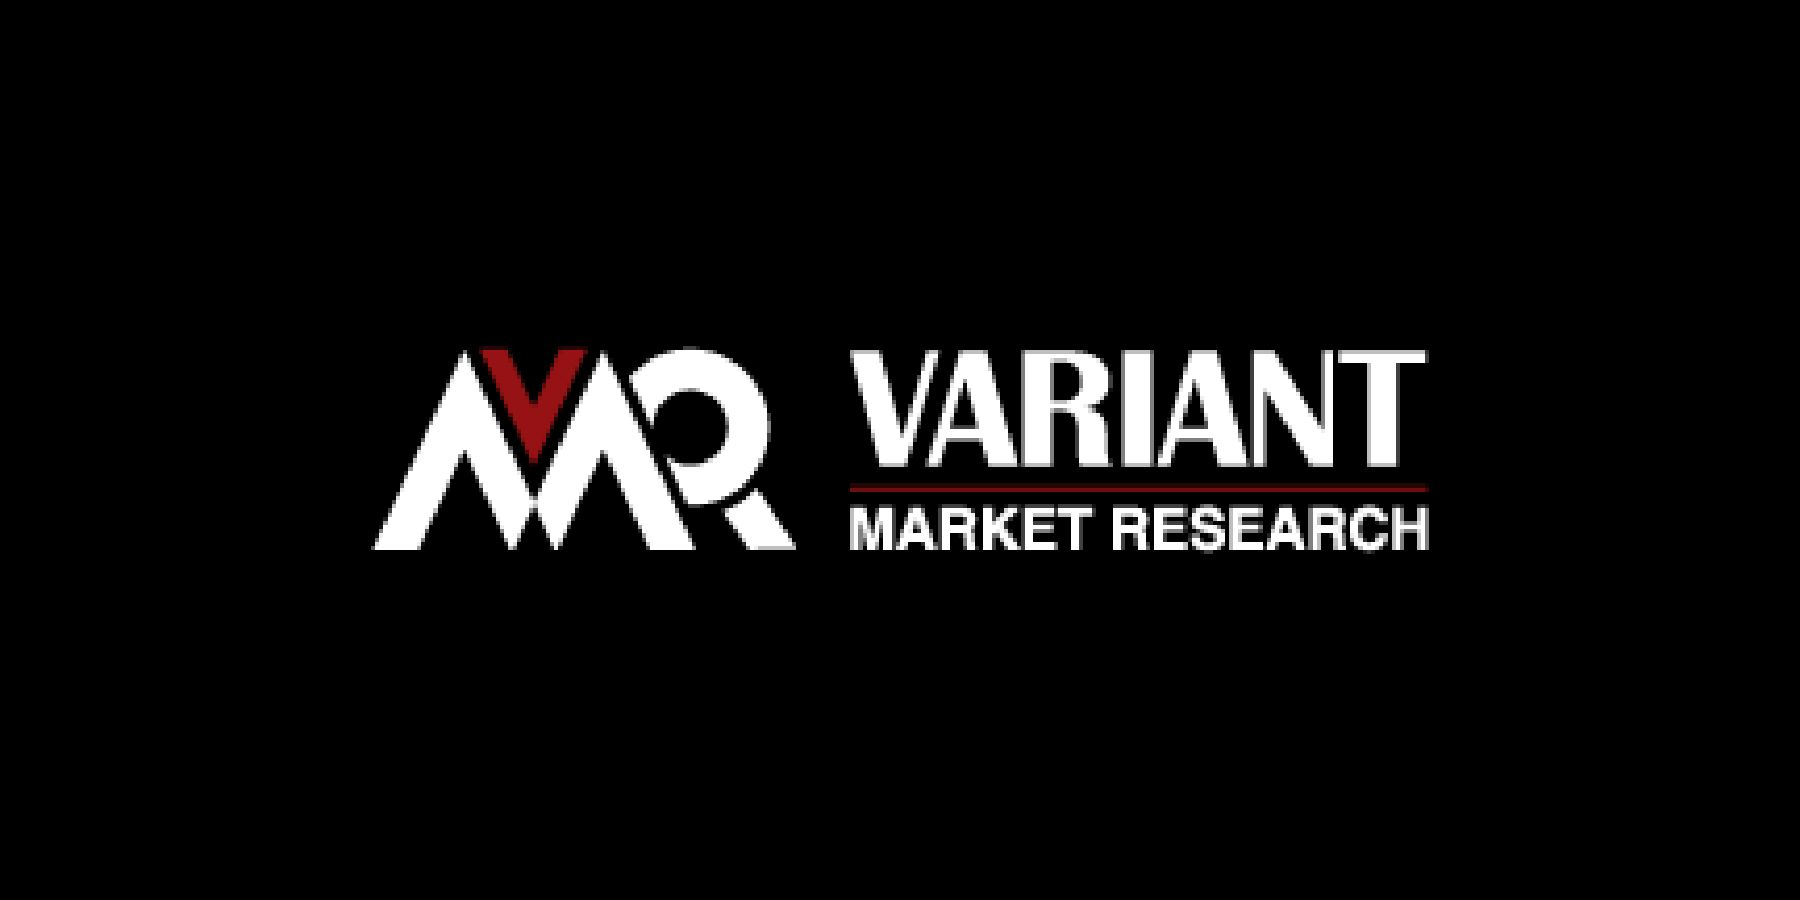 Variant-market-research-VMR-logo